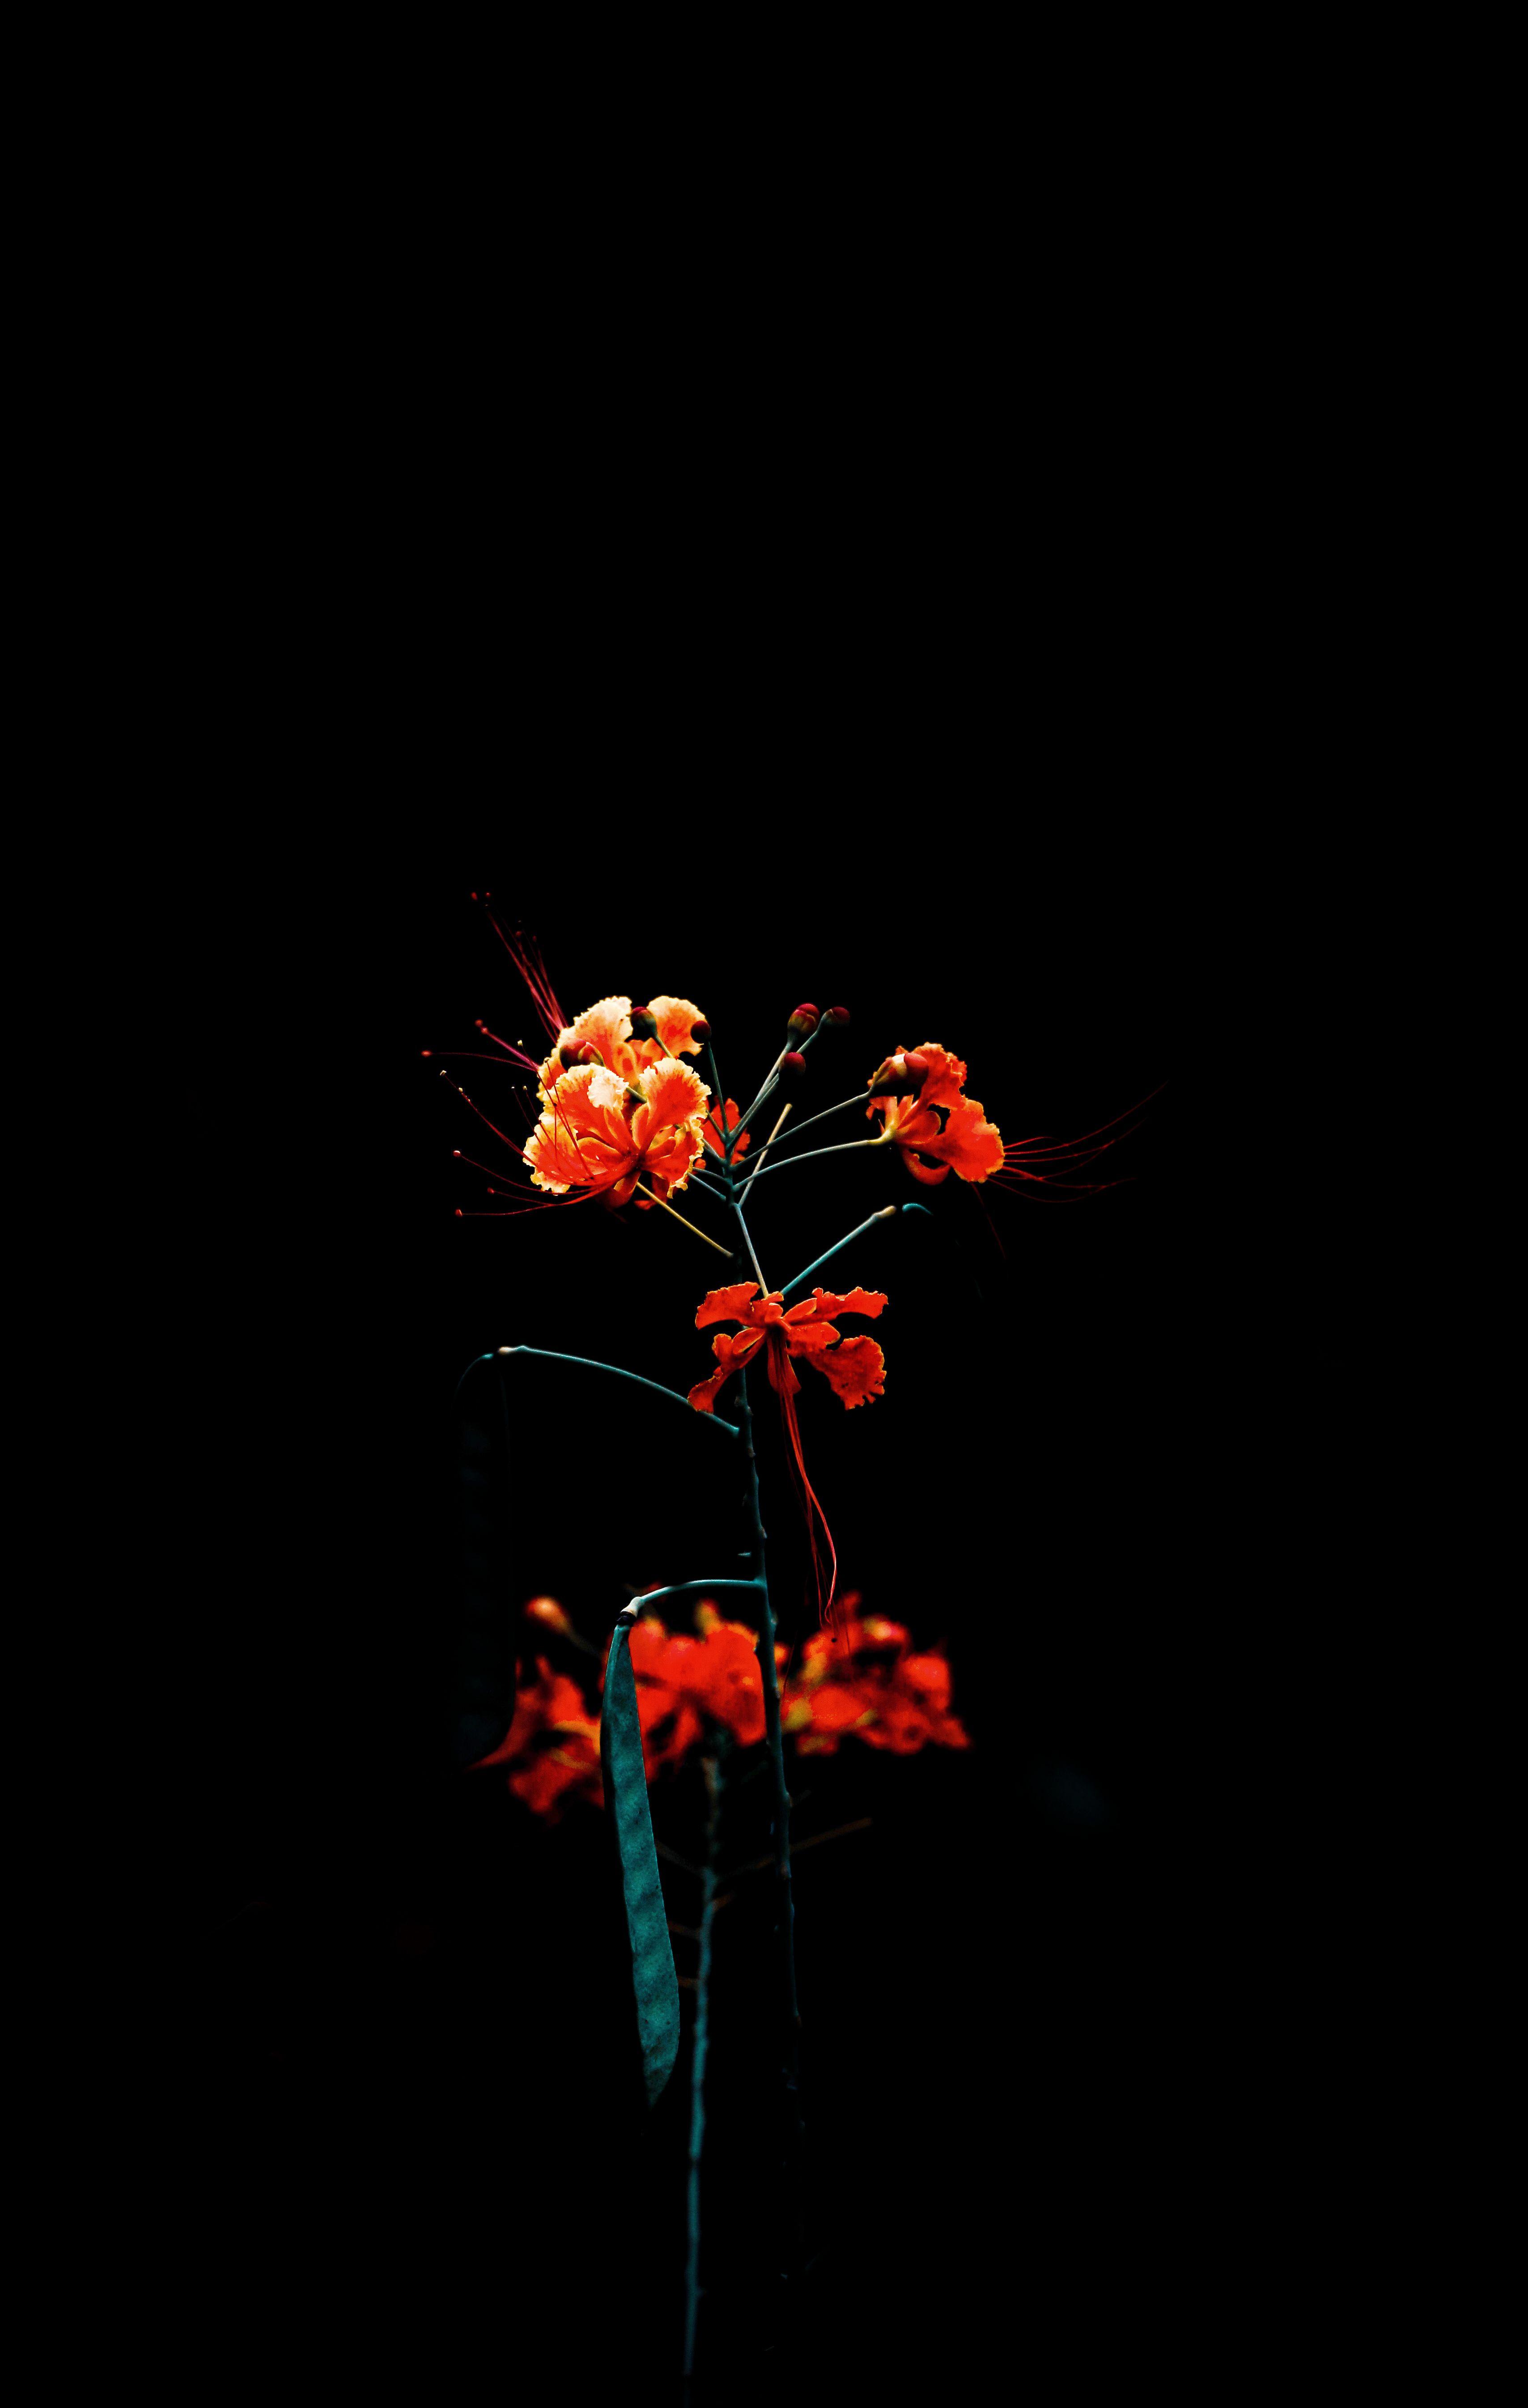 Free stock photo of beautiful, beautiful flowers, black